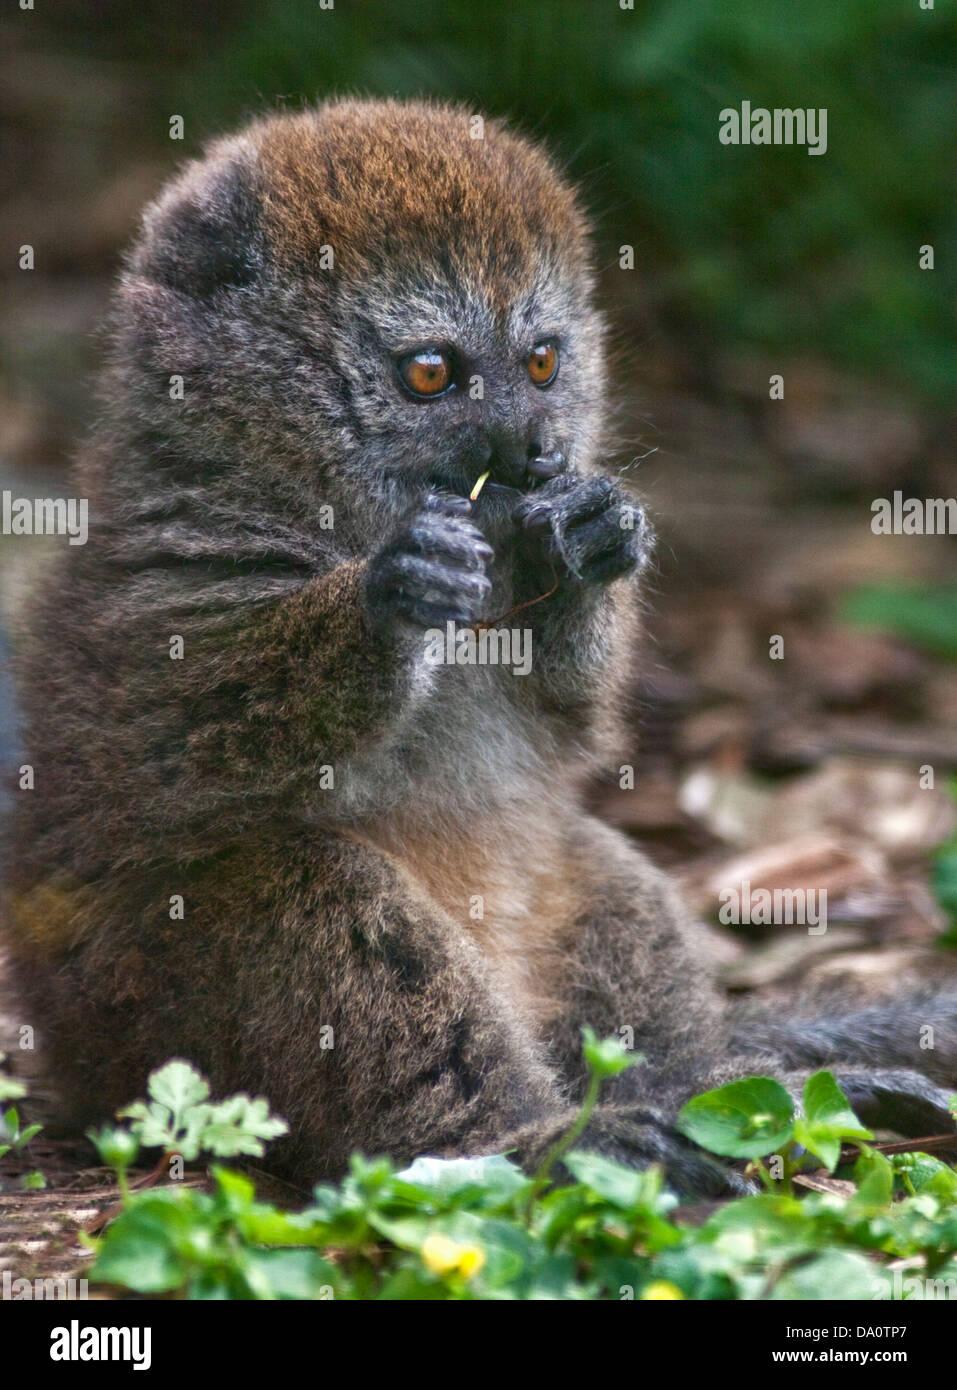 Baby Alaotran Gentle Lemur (hapalemur griseus alaotrensis) - Stock Image